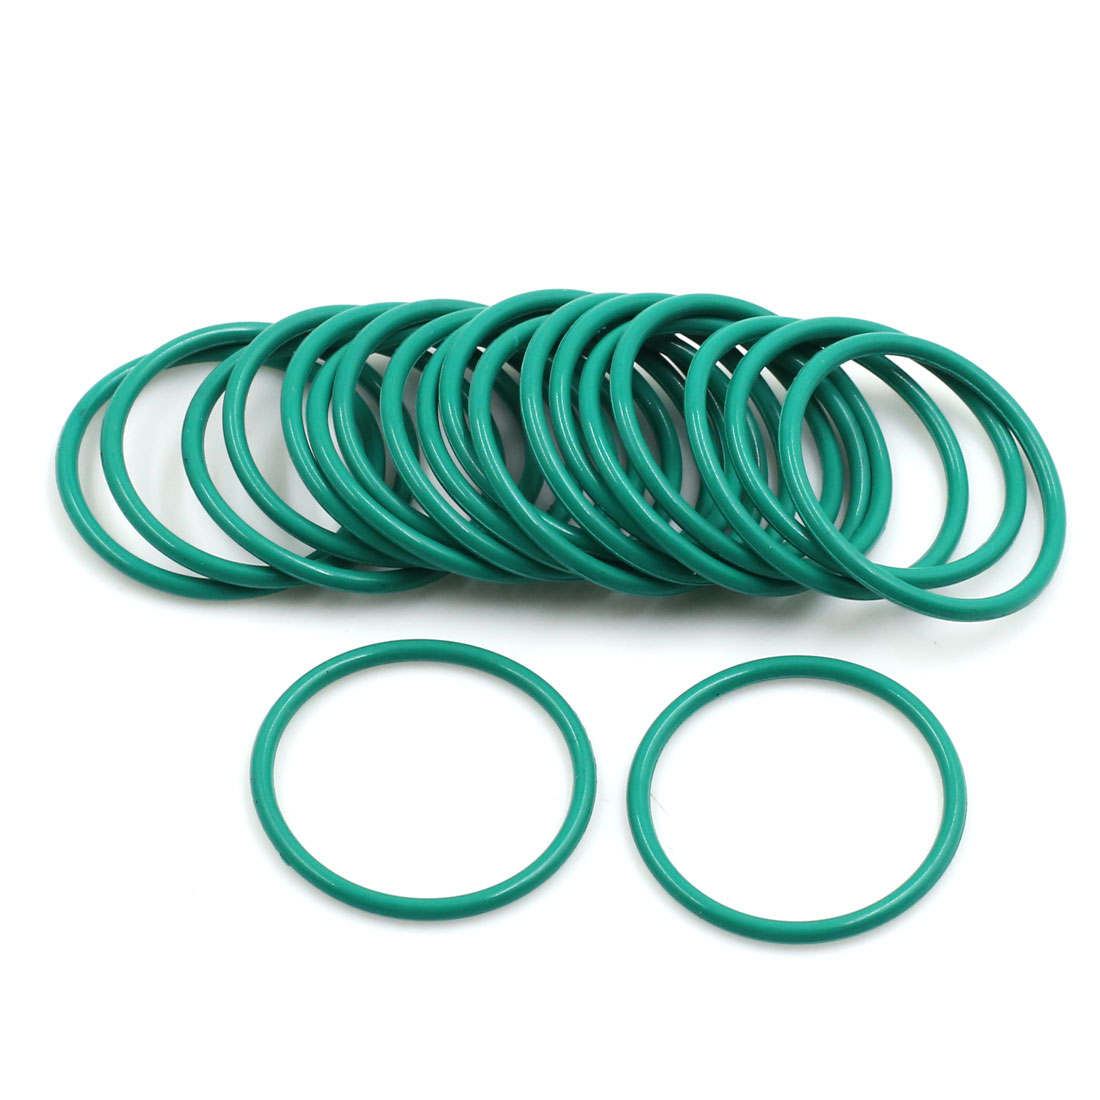 20pcs Green Universal FKM O-Ring Sealing Gasket Washer for Car 28mm x 2mm